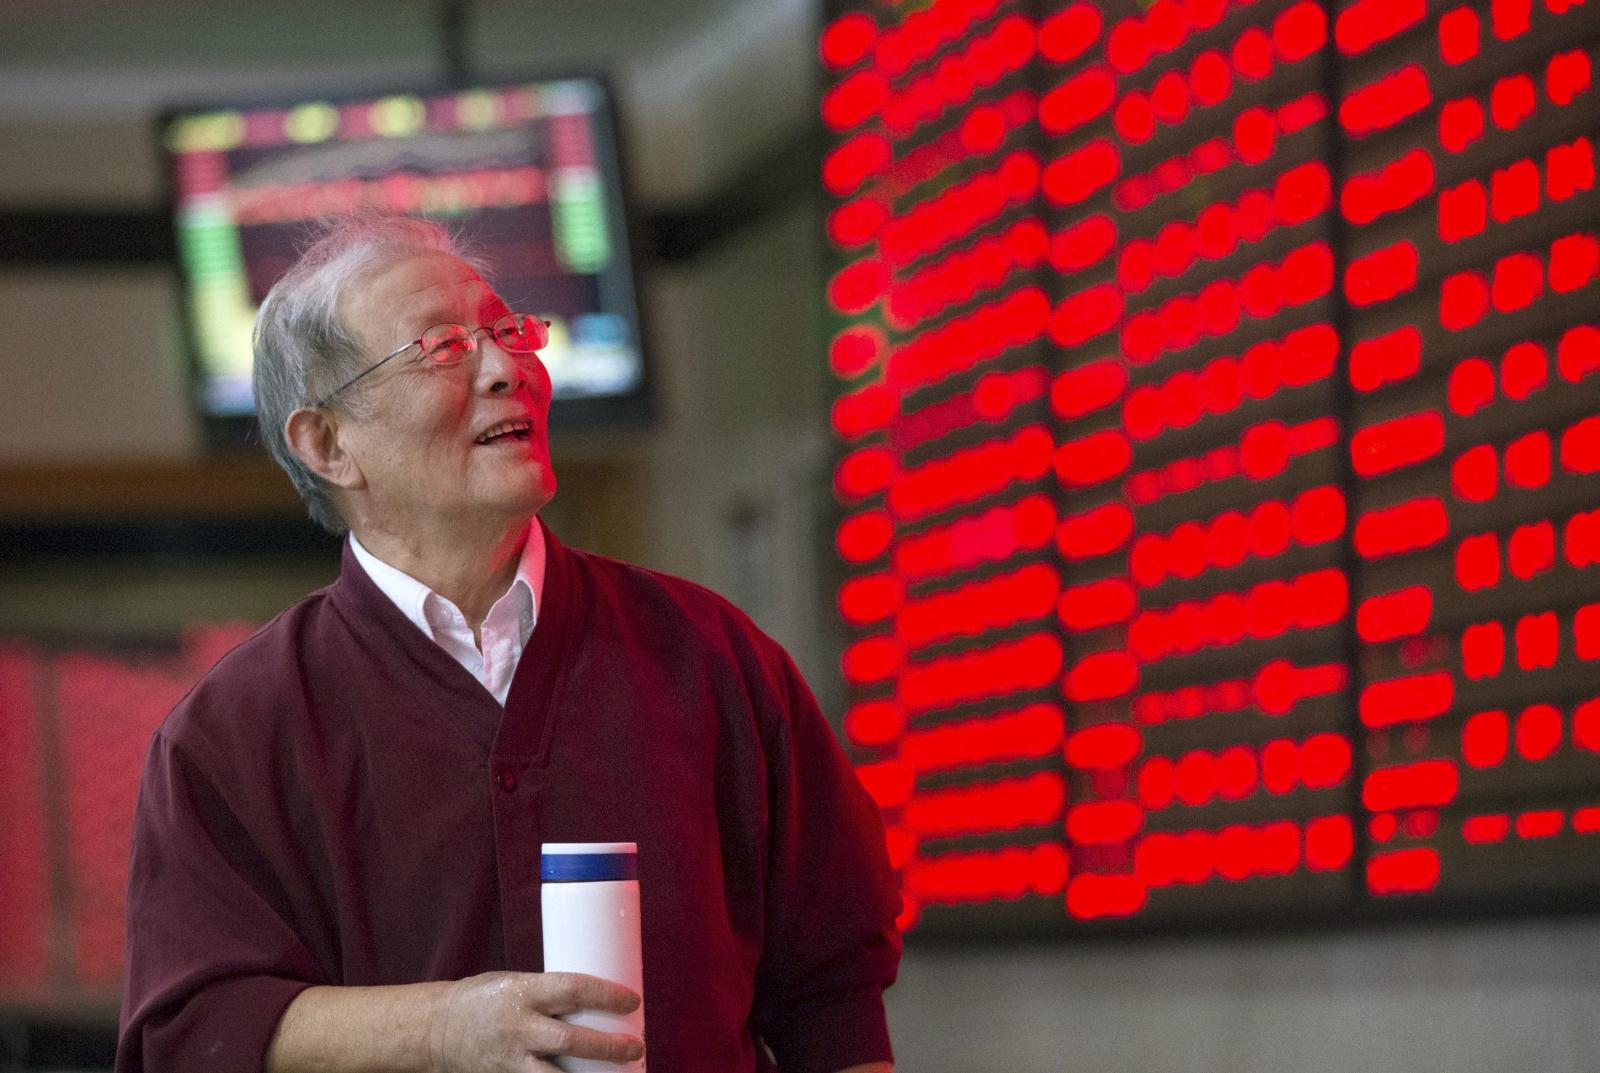 Asian markets: Shanghai Composite gains following Goldman Sachs report and positive Japanese data